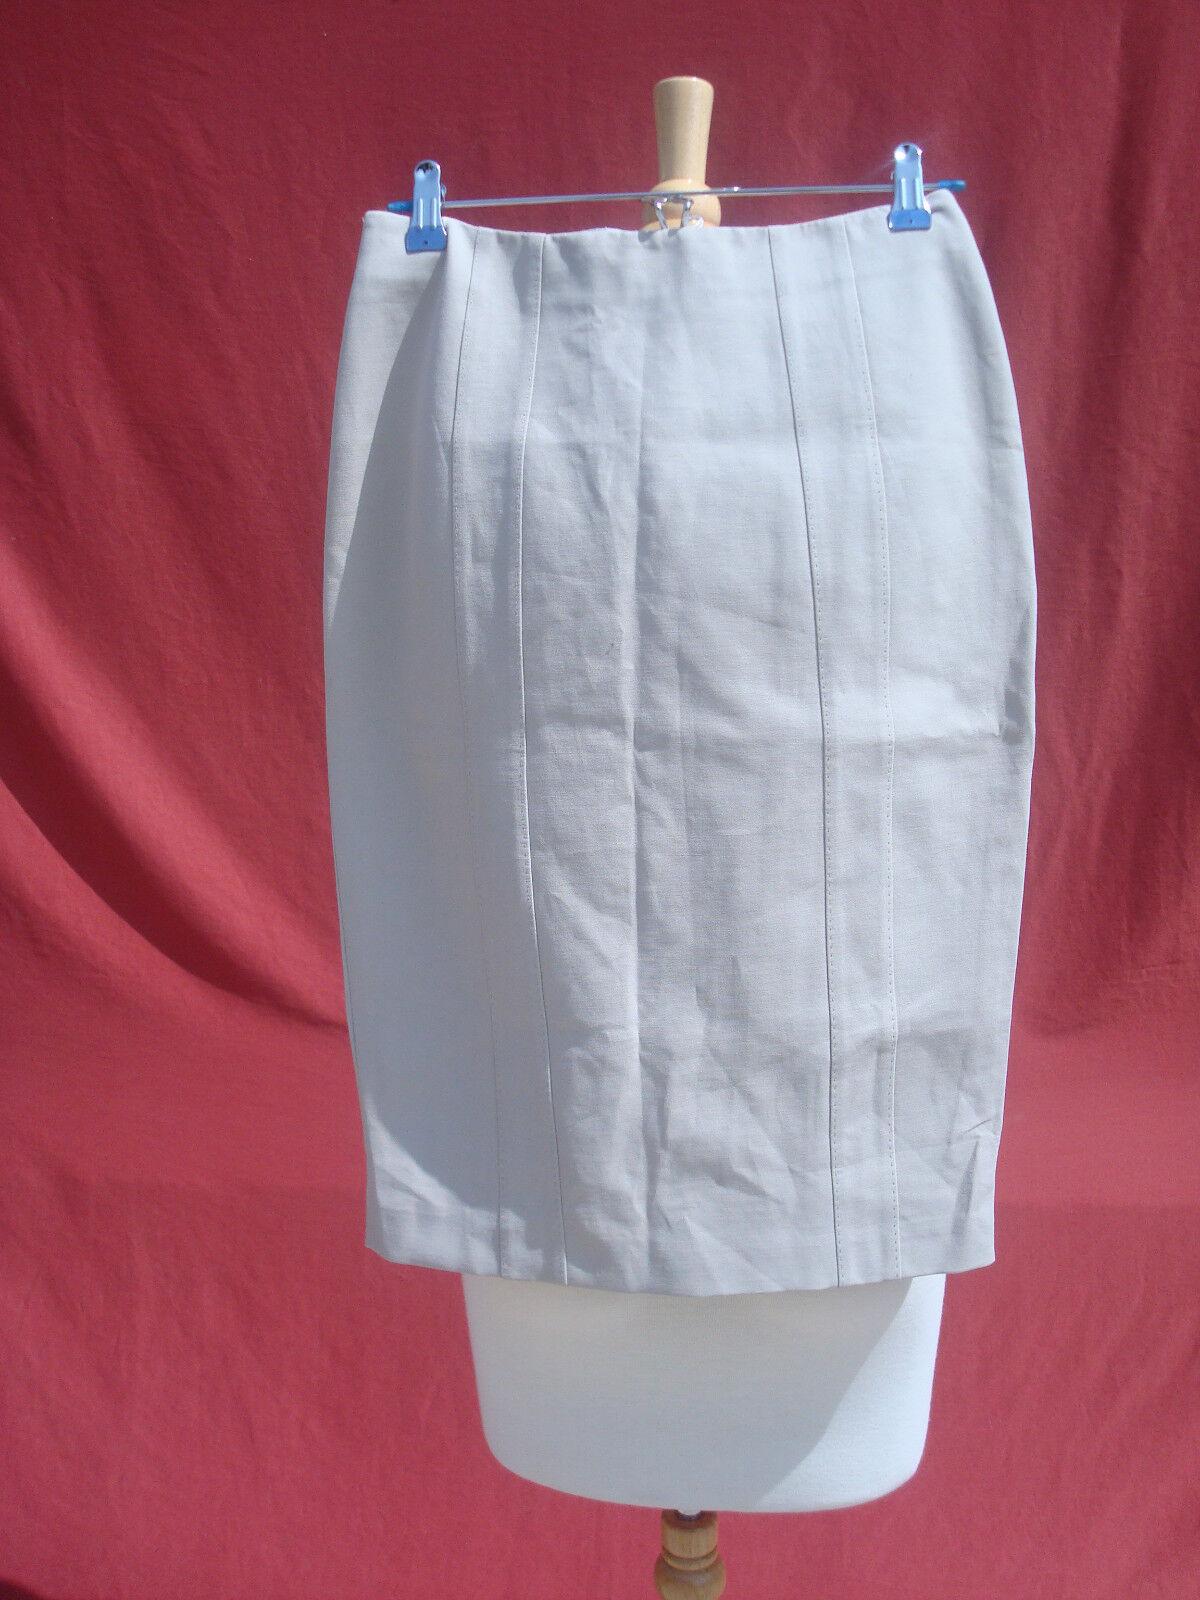 NWT Armani Collezioni Beige Cotton Polyester Spandex Women's Skirt 2   440